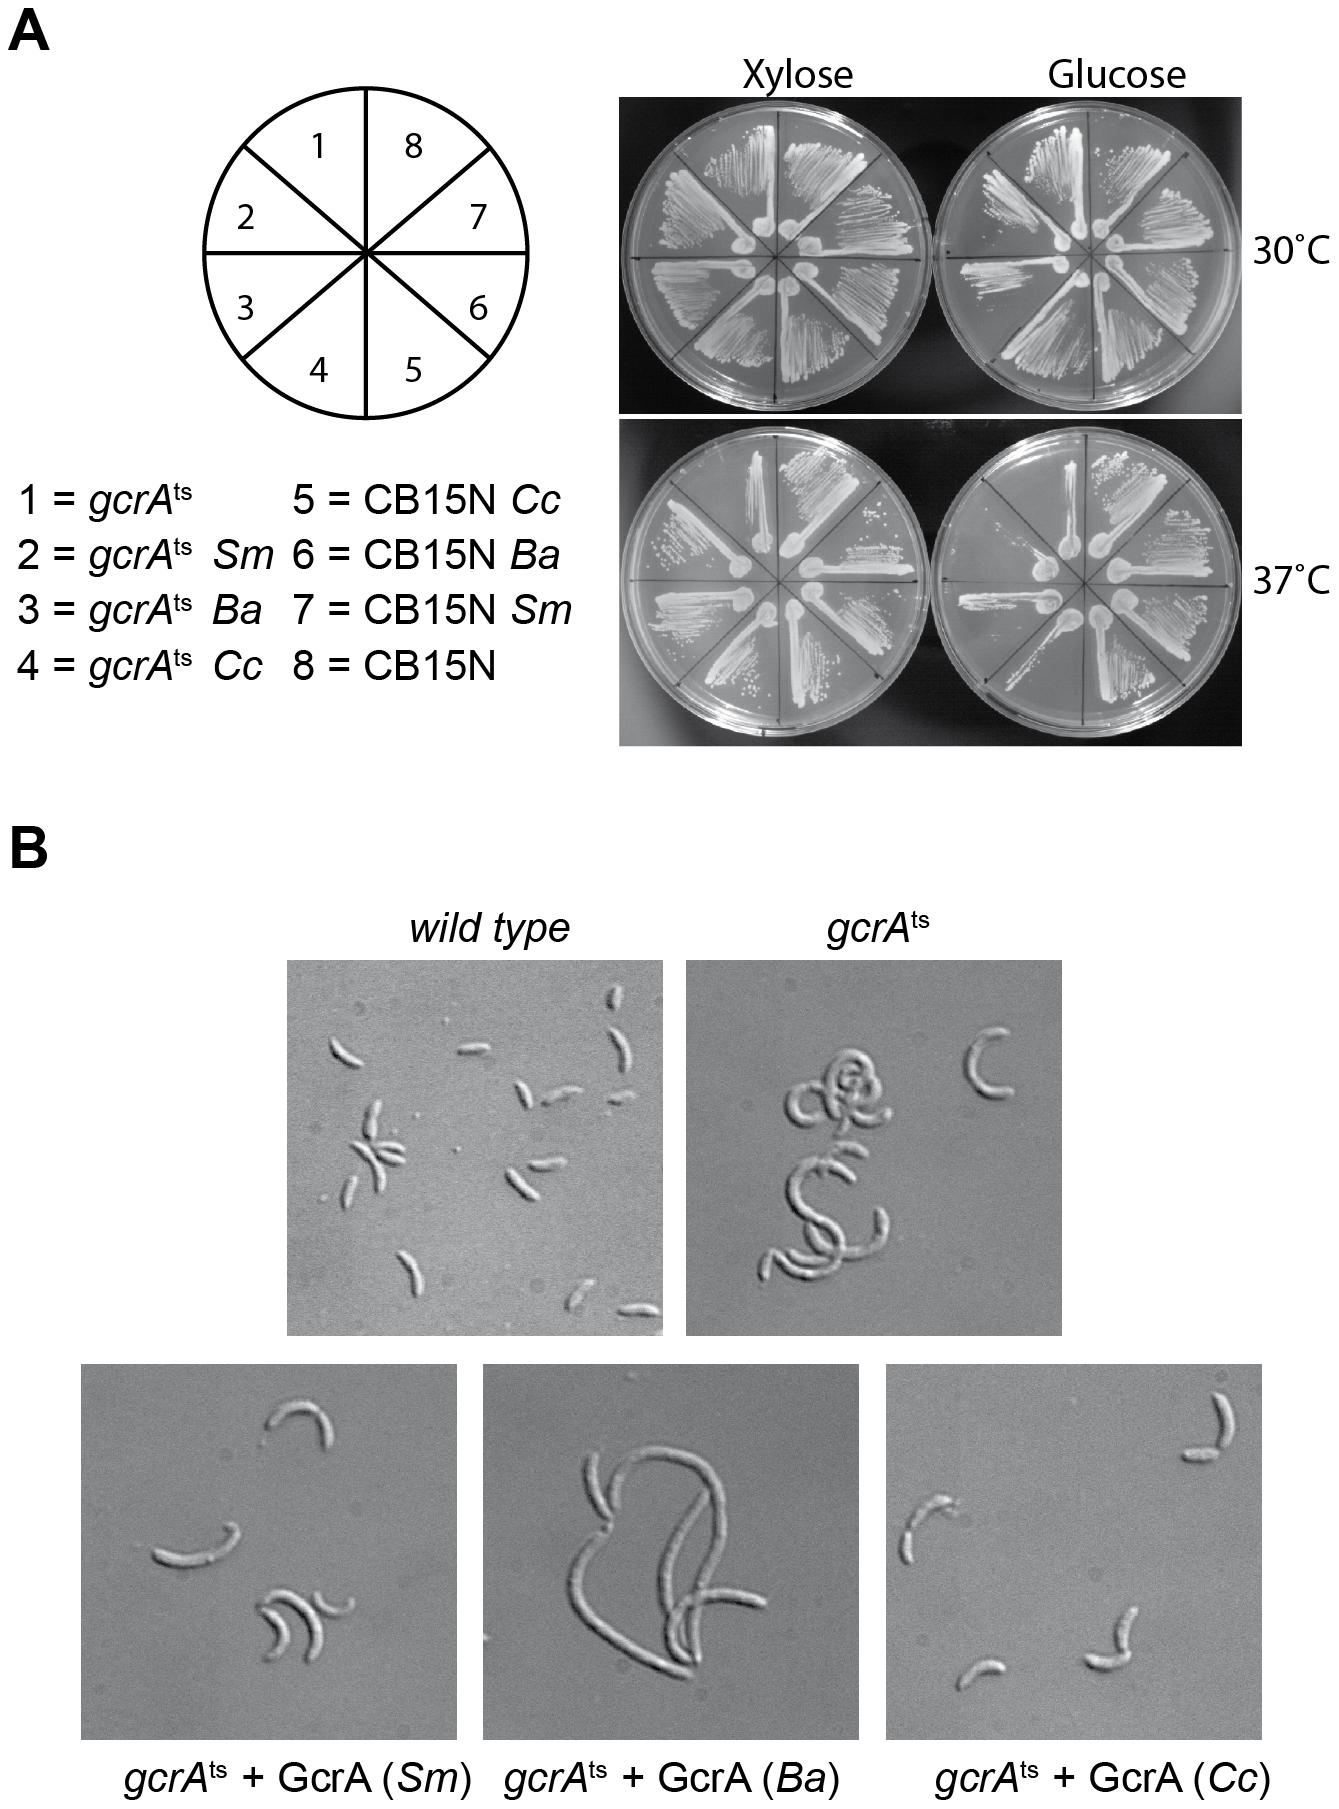 GcrA orthologs in <i>Alphaproteobacteria</i>.